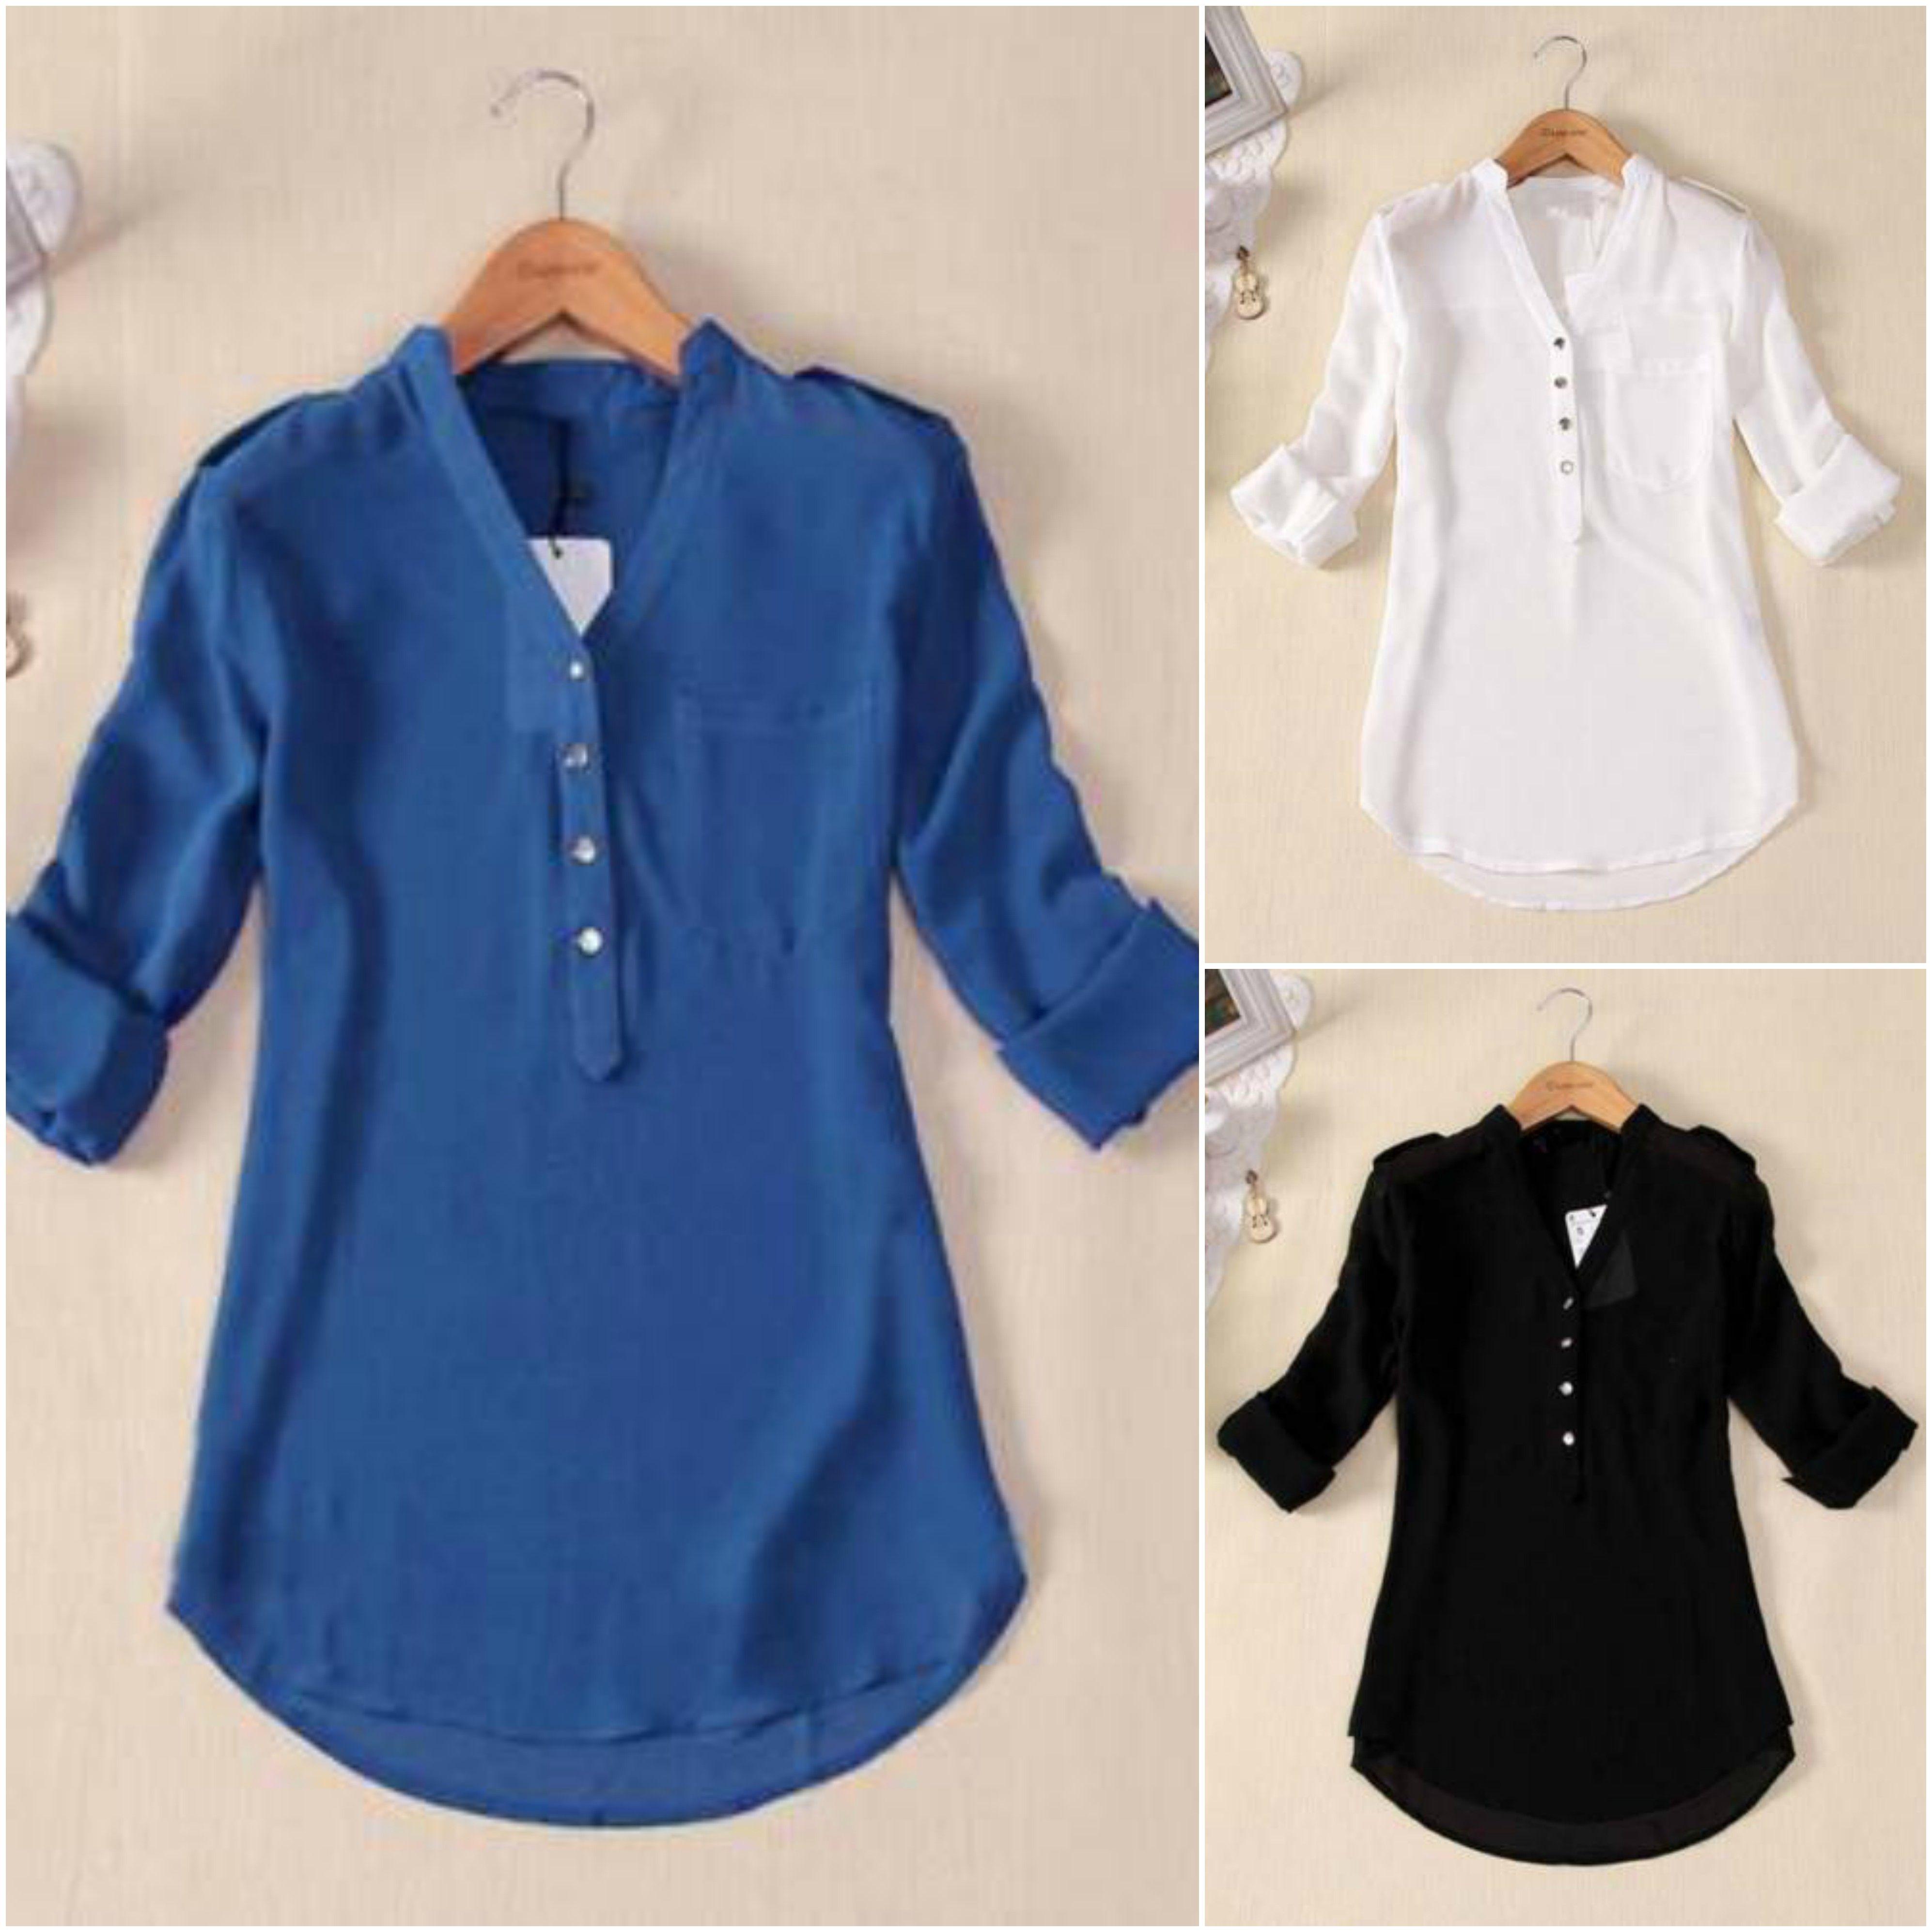 08d925ba70f Plus Size XS-4XL Sexy Women Chiffon Top Pullover Long Sleeve V Neck Button  T Shirt Blouse Hot Blouse     Size XS